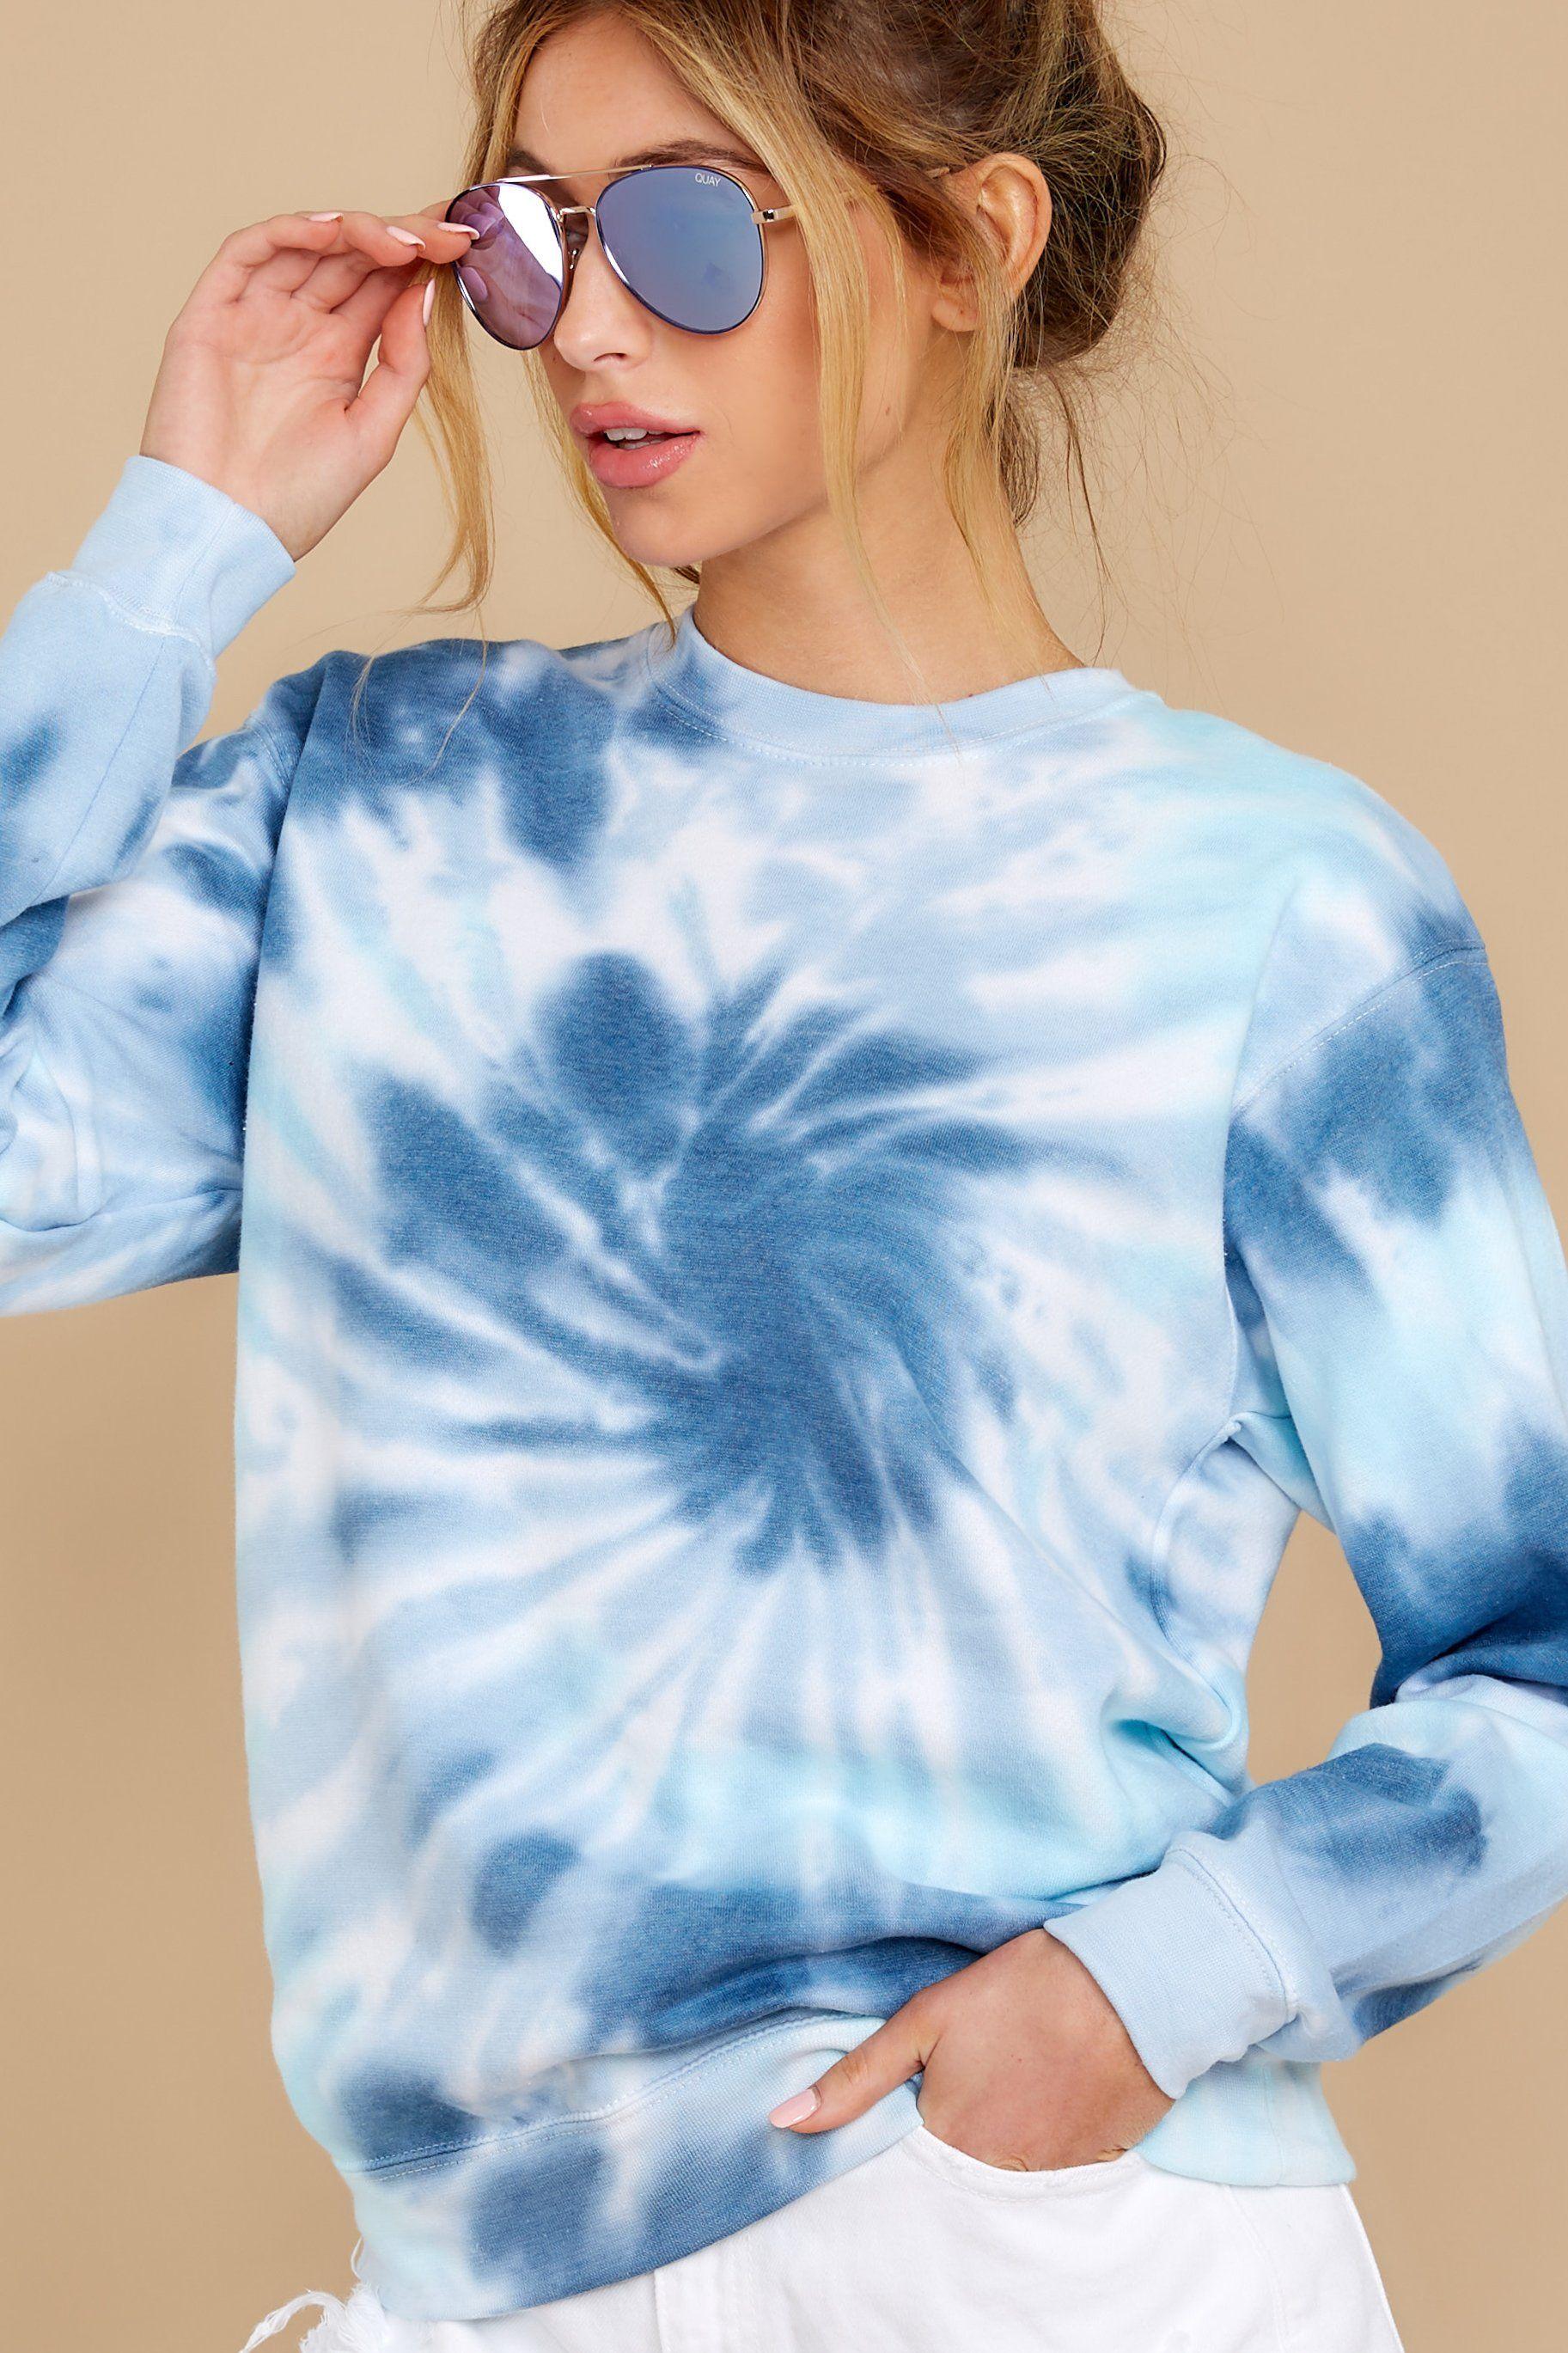 Blur The Lines Sea Blue Navy Spiral Tie Dye Sweatshirt Tie Dye Outfits Tie Dye Sweatshirt Tye Dye Shirts [ 2738 x 1825 Pixel ]